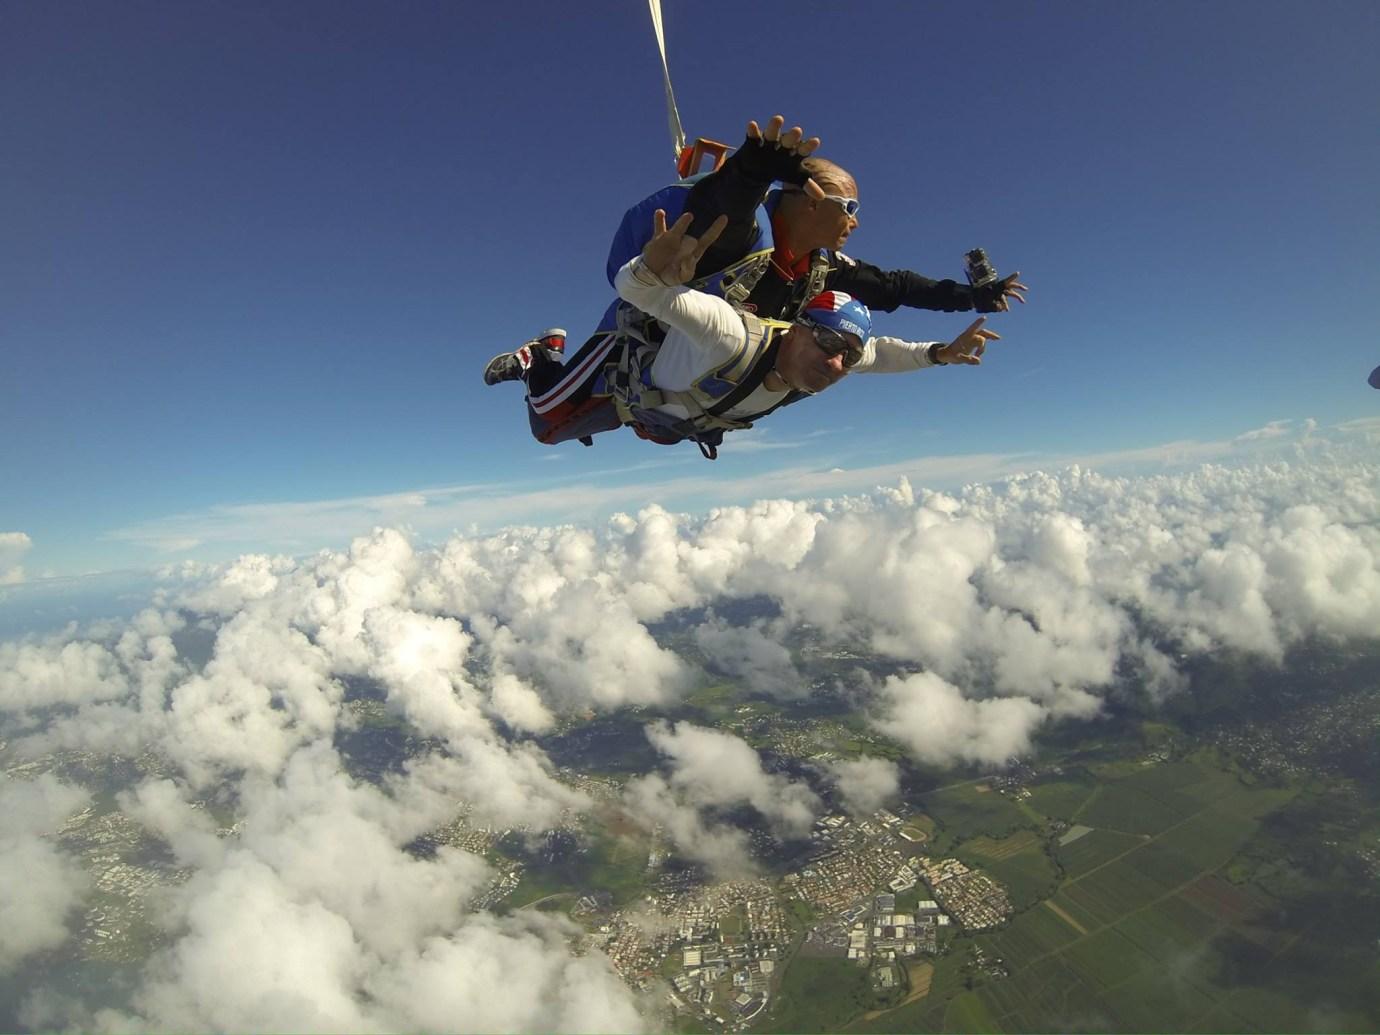 martinique parachute